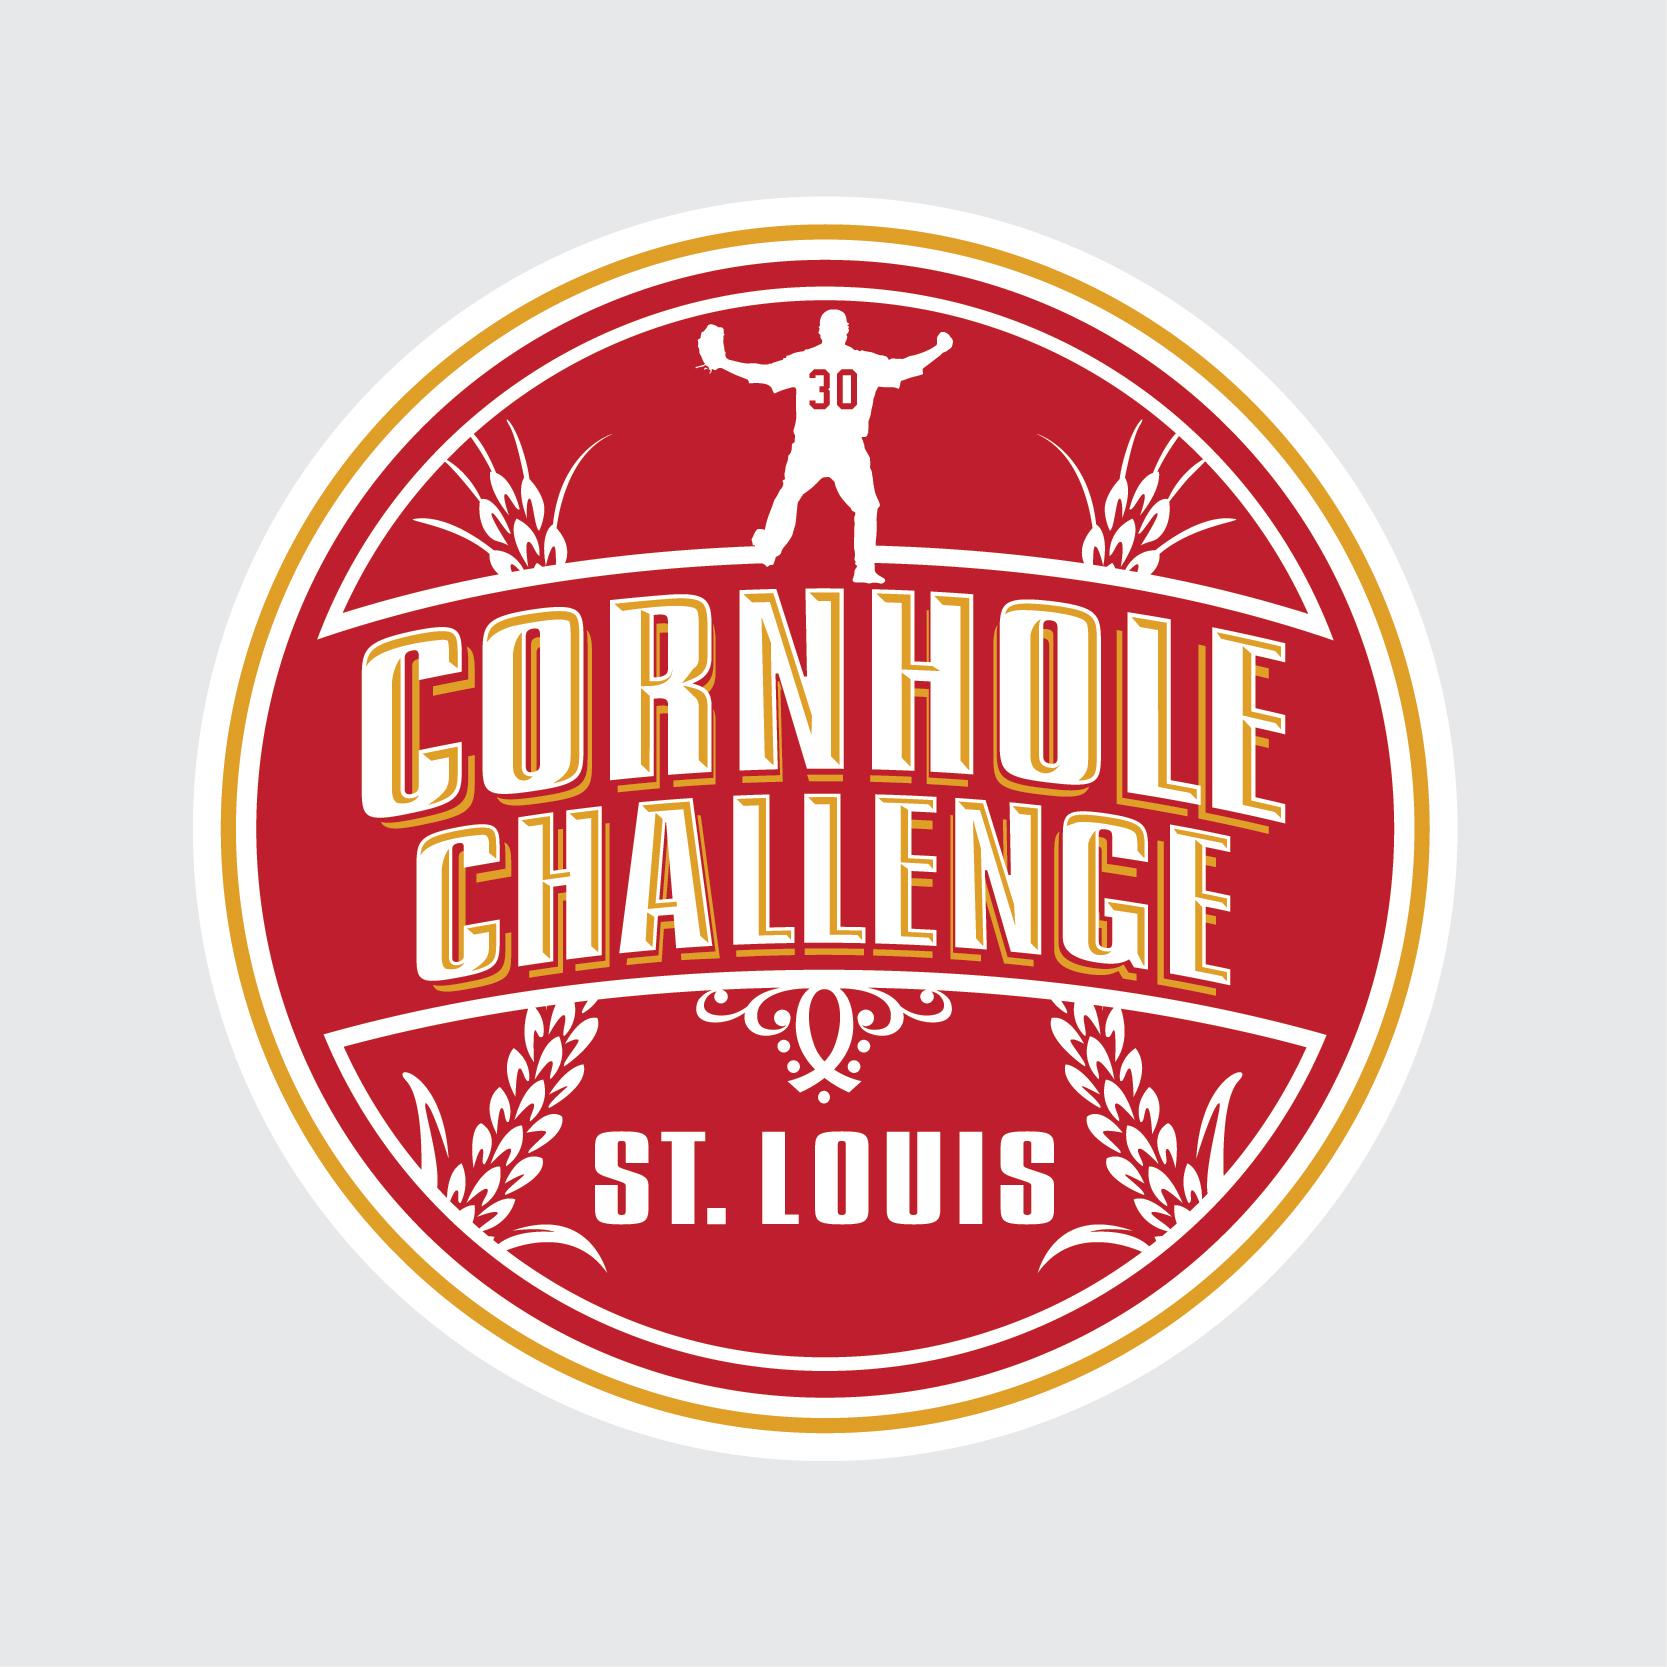 2017 Cornhole Challenge Logo